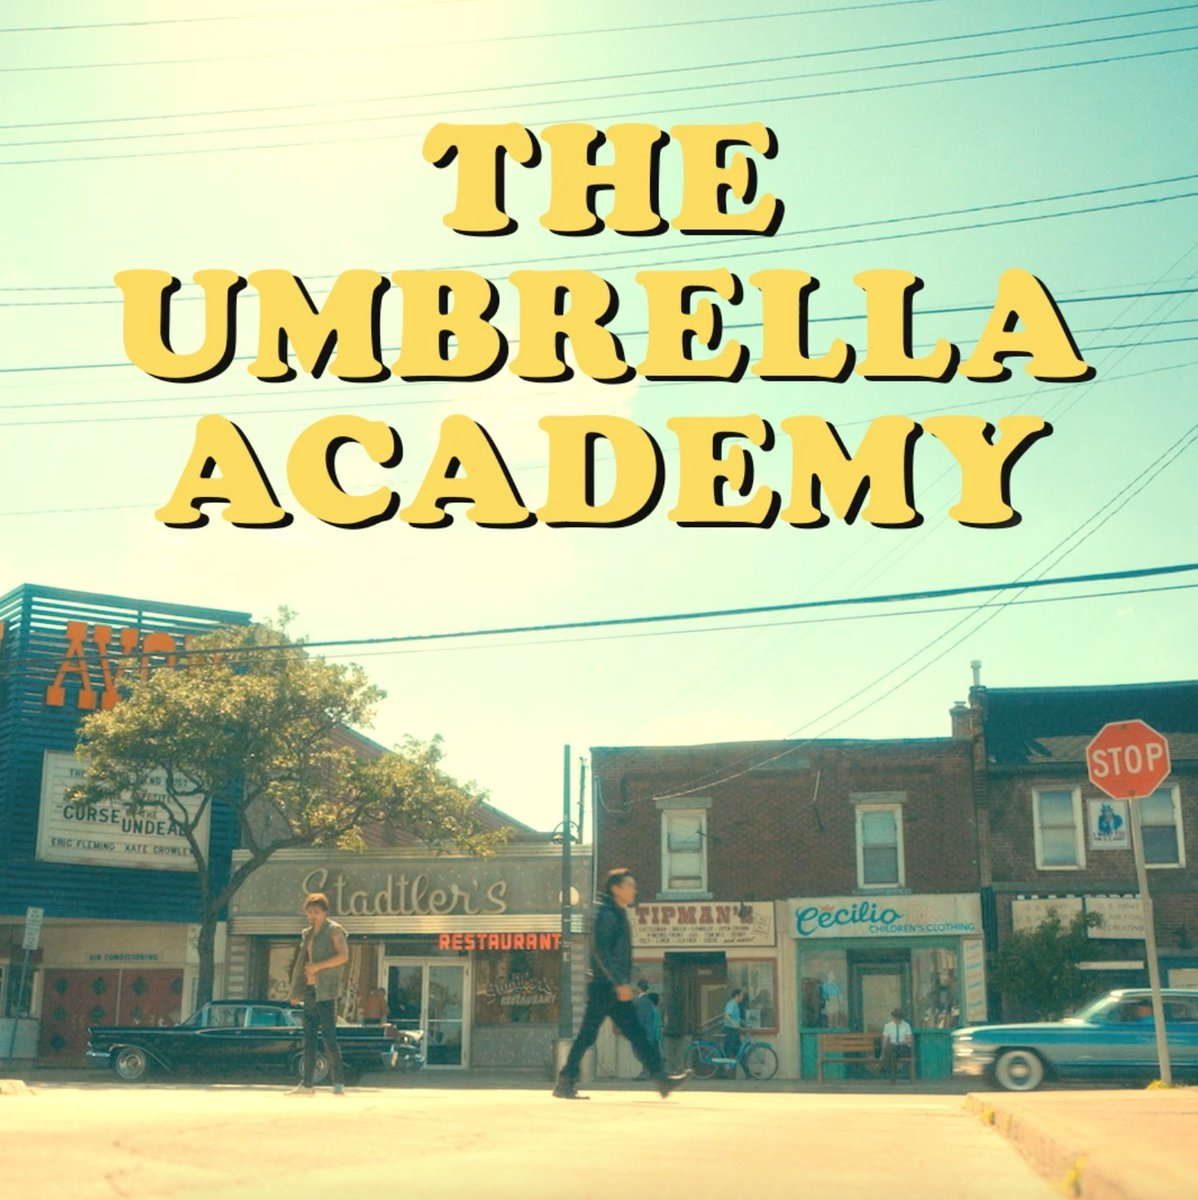 The Umbrella Academy! Coming to a Silvertone Omega near you! ... 2